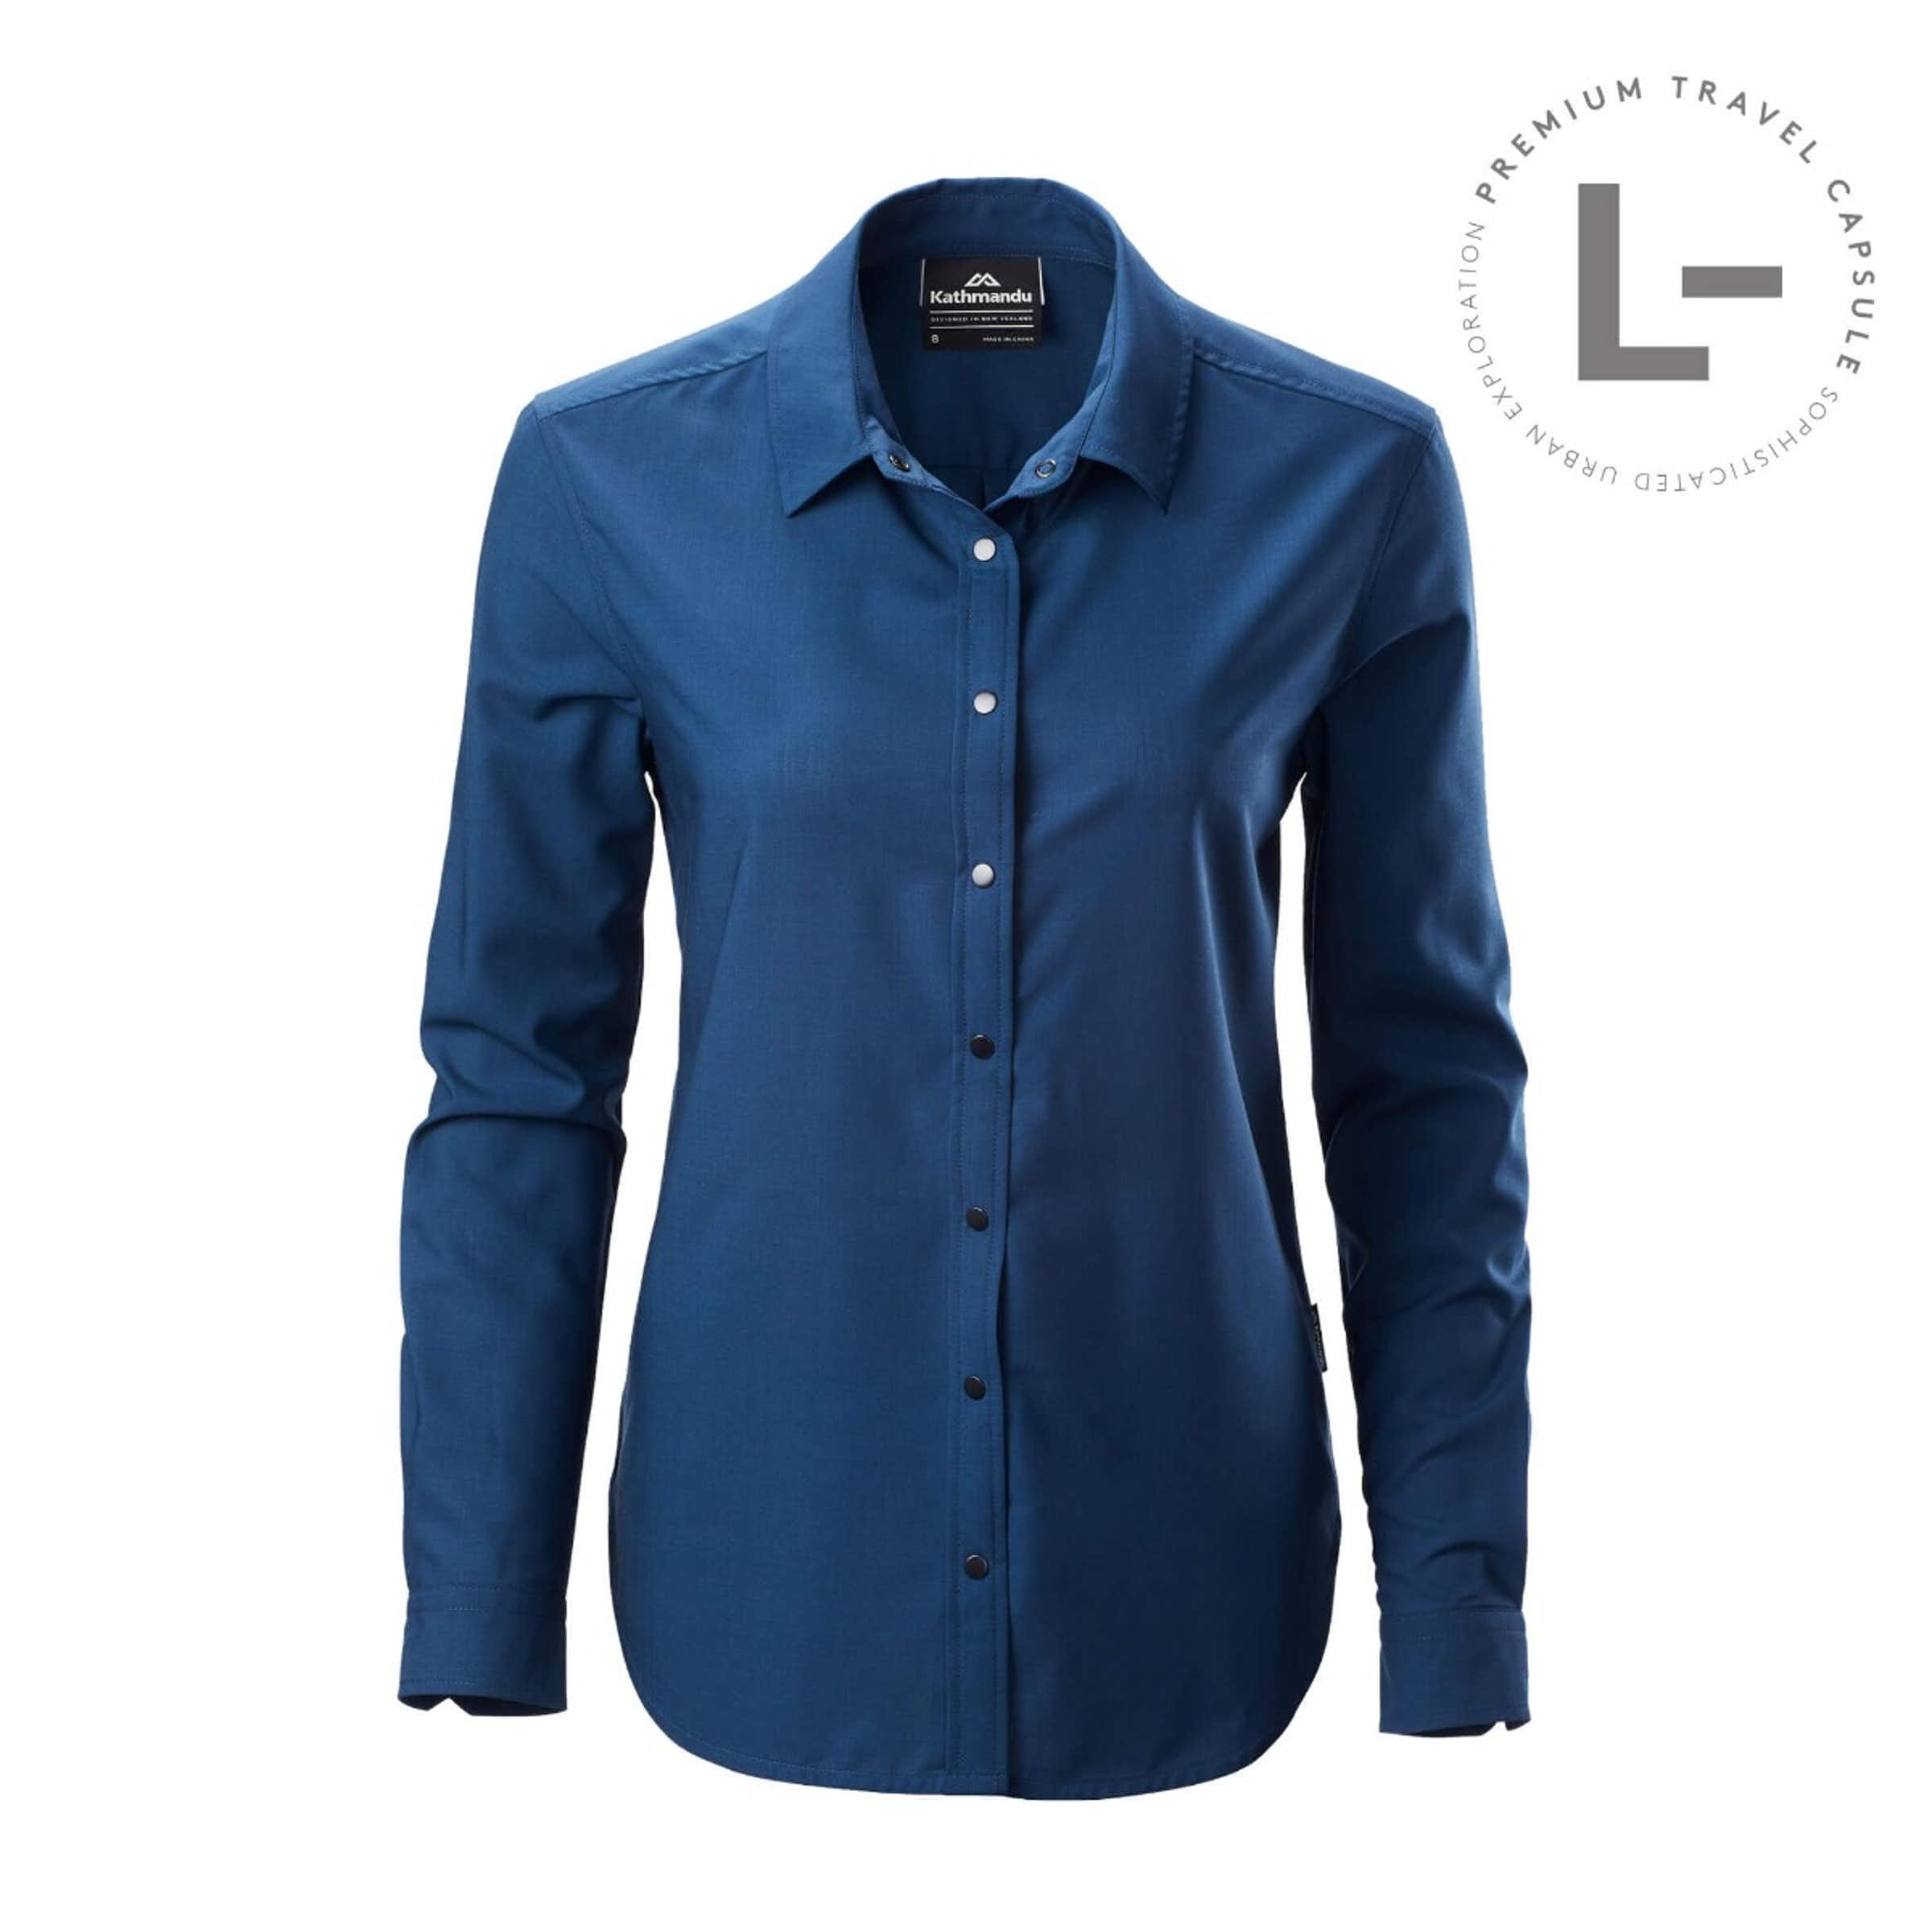 5bb4b972cf8344 Tops for Women: T-shirts & Shirts Online in Australia | Kathmandu